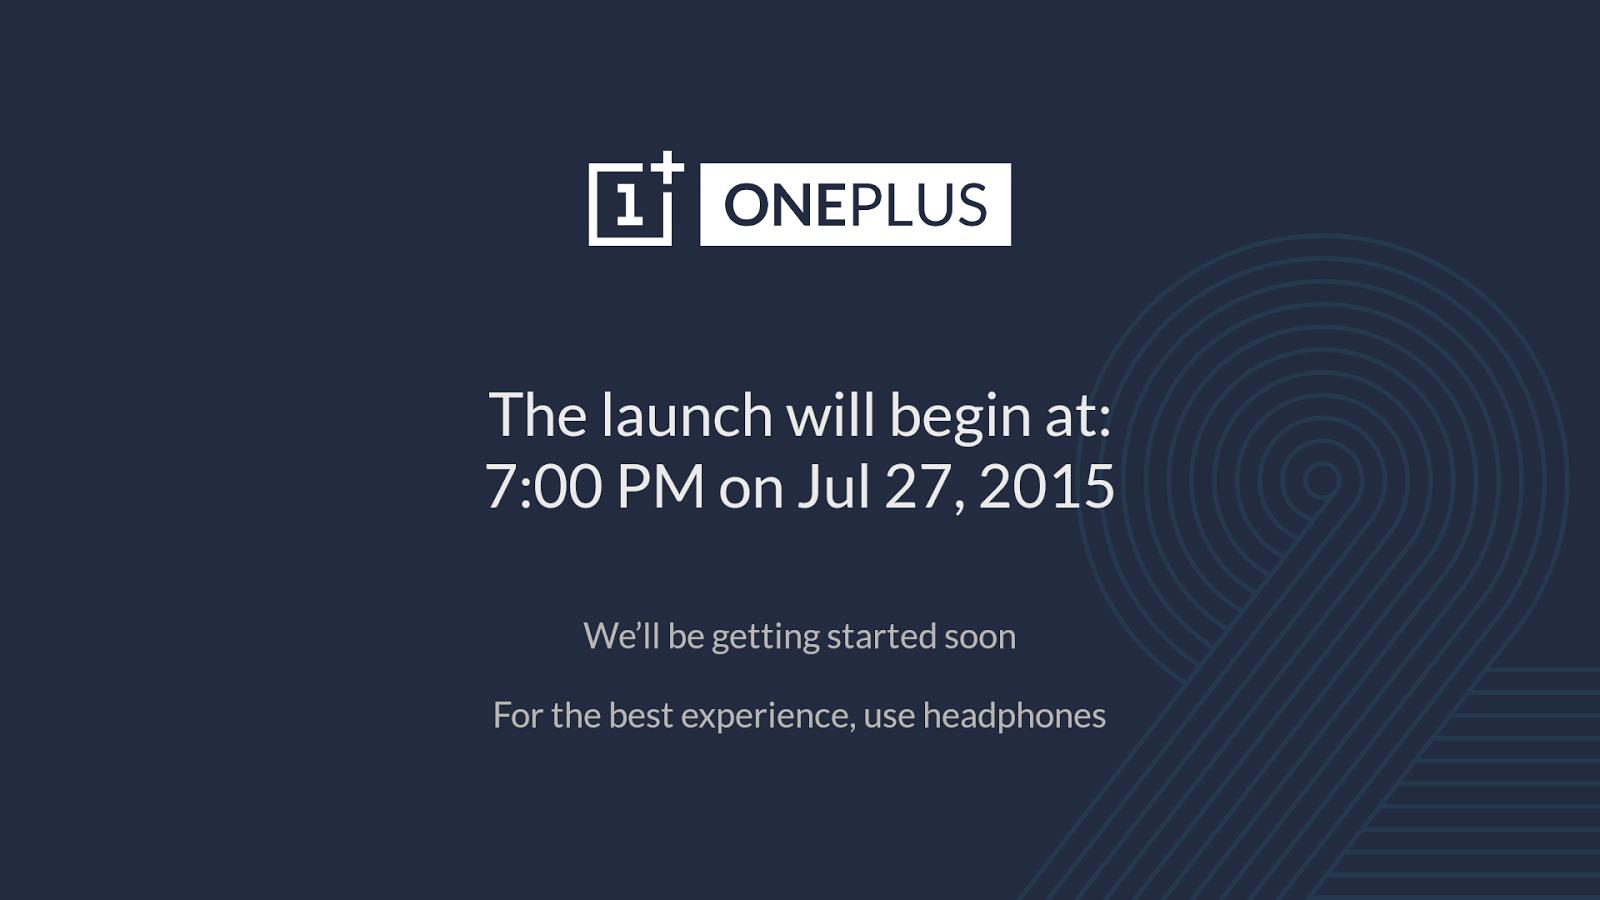 OnePlus 2 Launch لمشاهدة الإعلان عن الهاتف المنتظر ون بلس 2